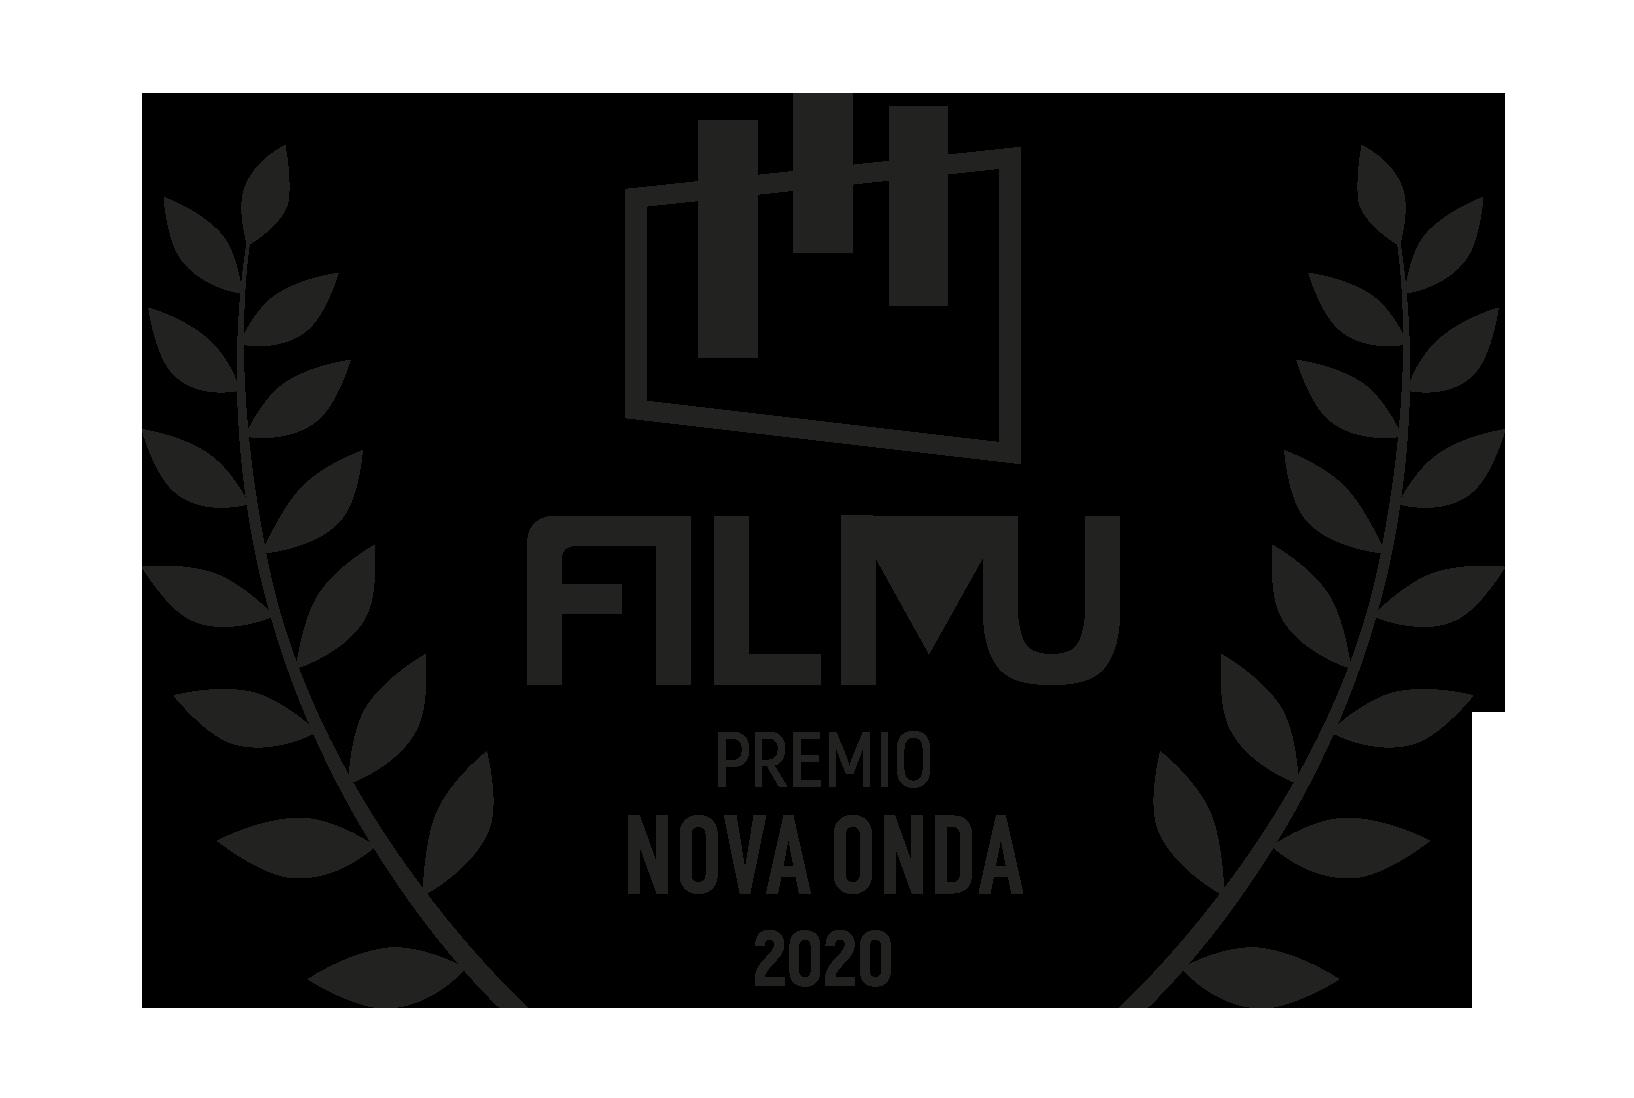 Laurel Premio Nova Onda FILMU